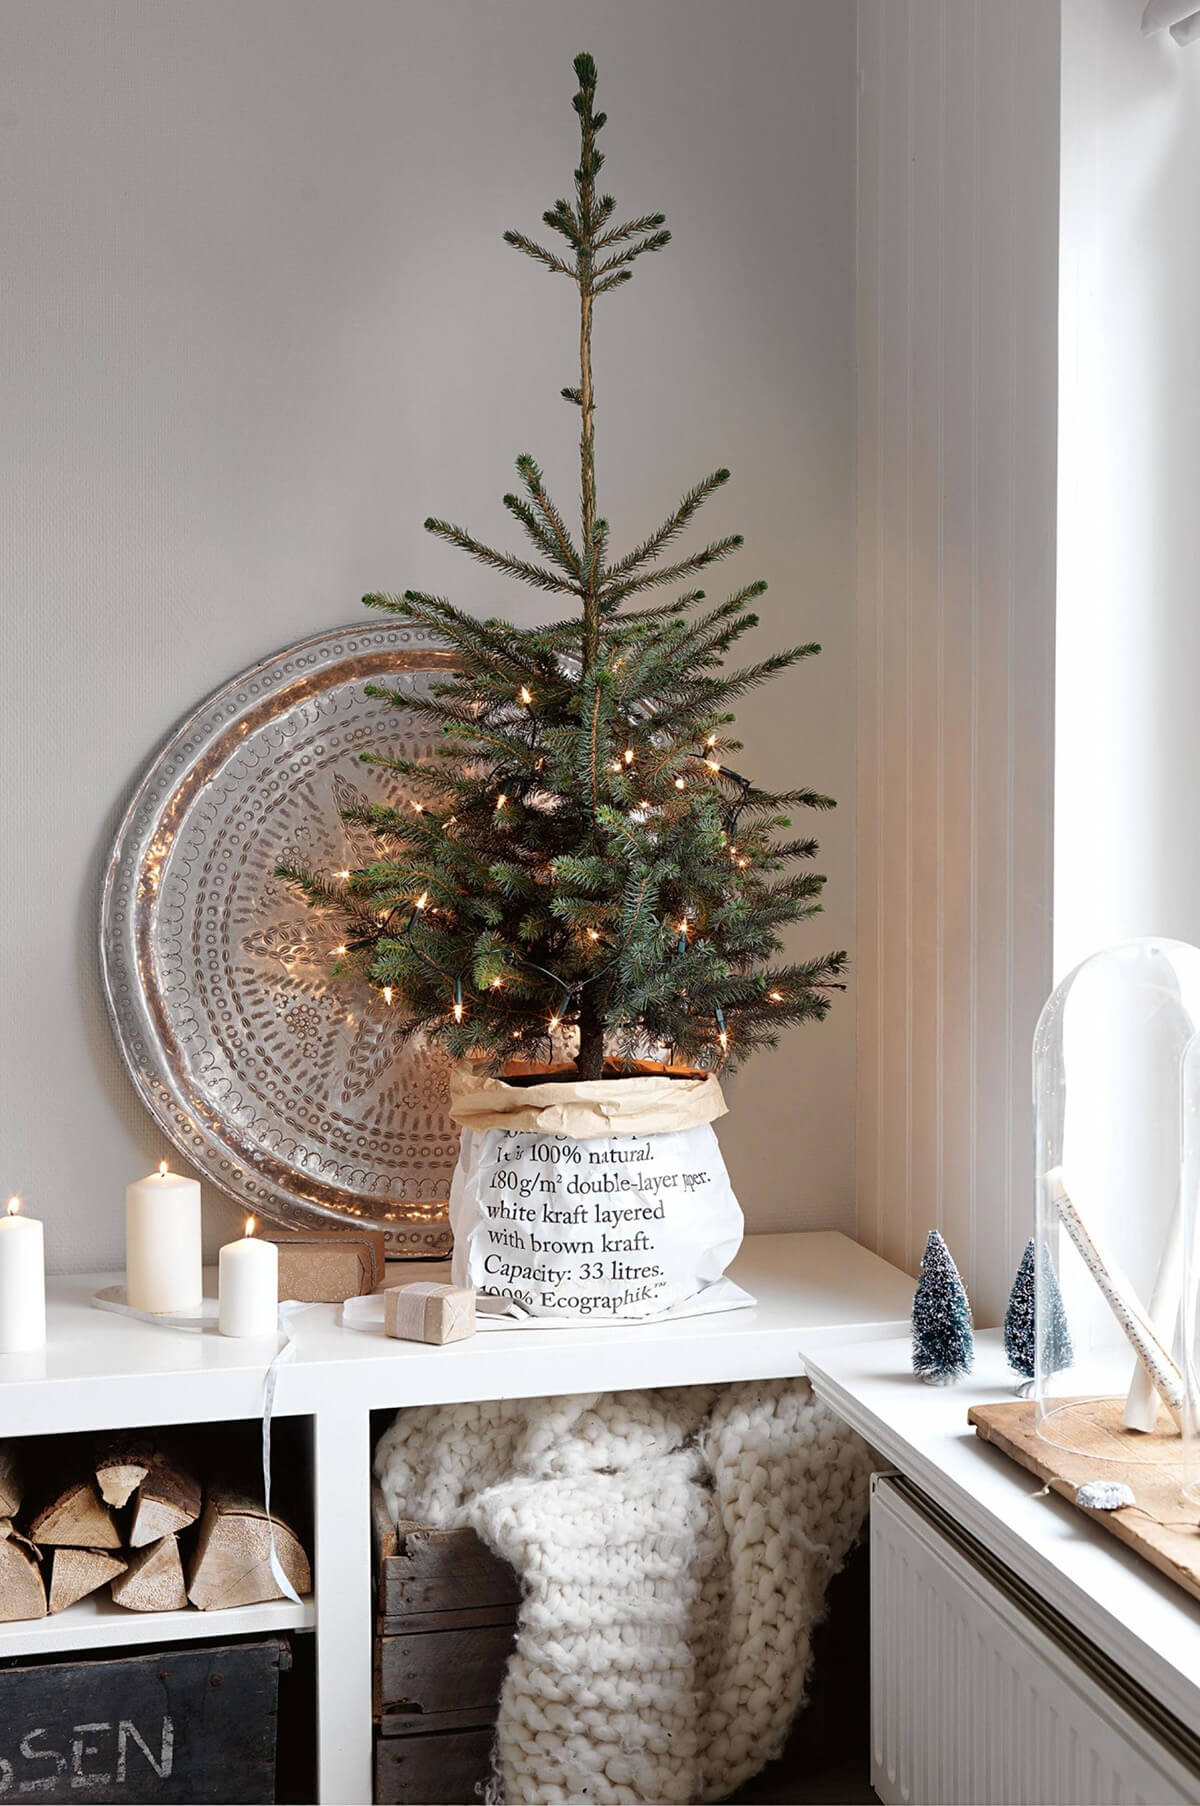 Mini Rustic Potted Christmas Tree